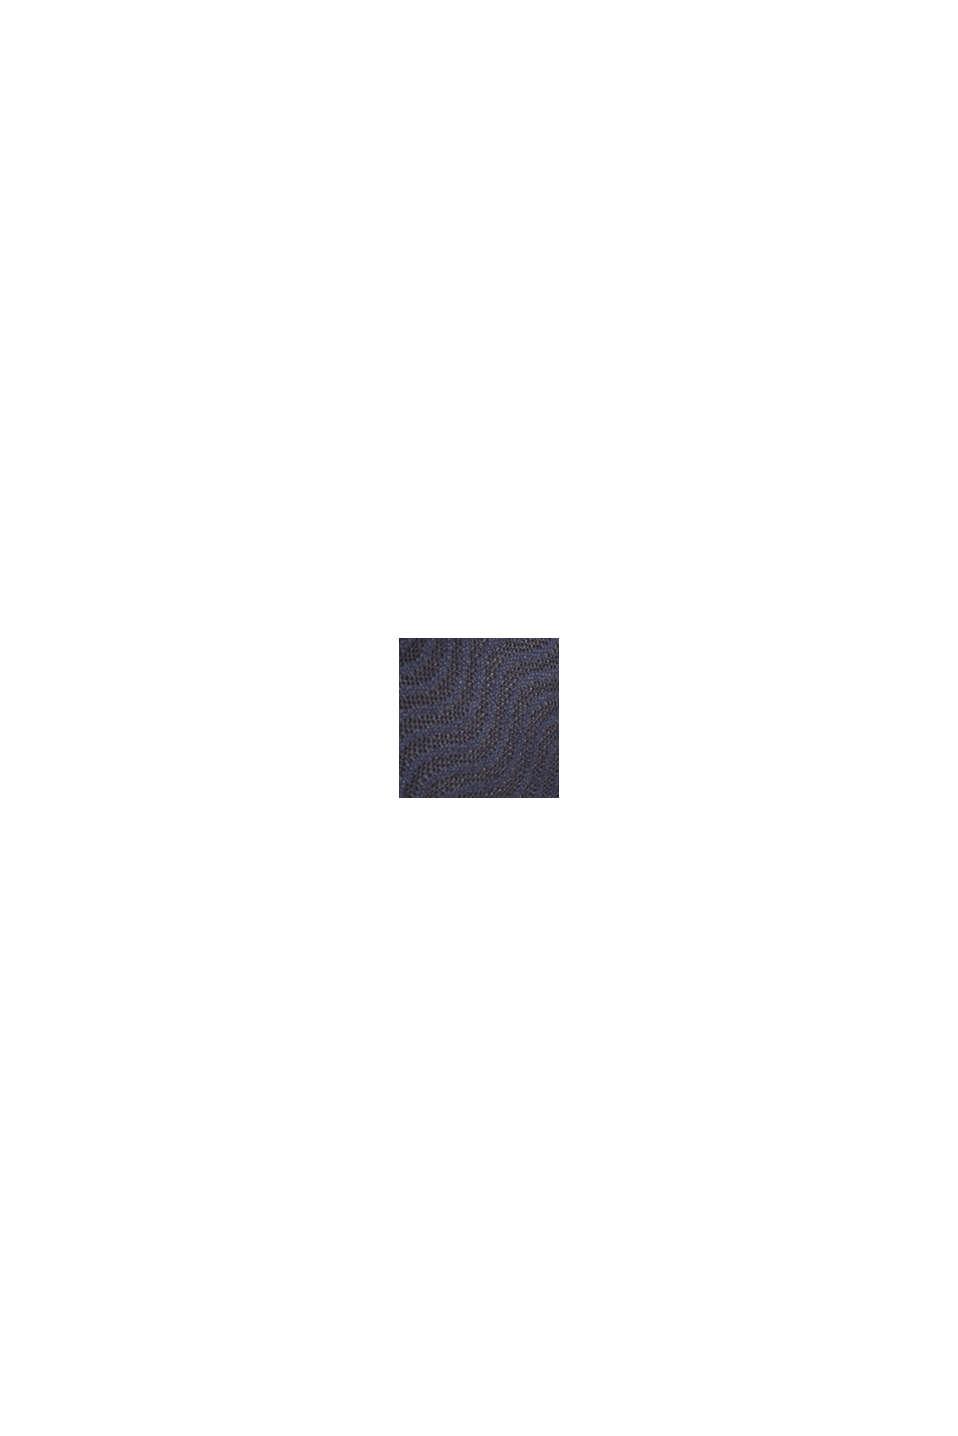 Unwattiertes Bügel-Top aus wellenförmiger Spitze, NAVY, swatch